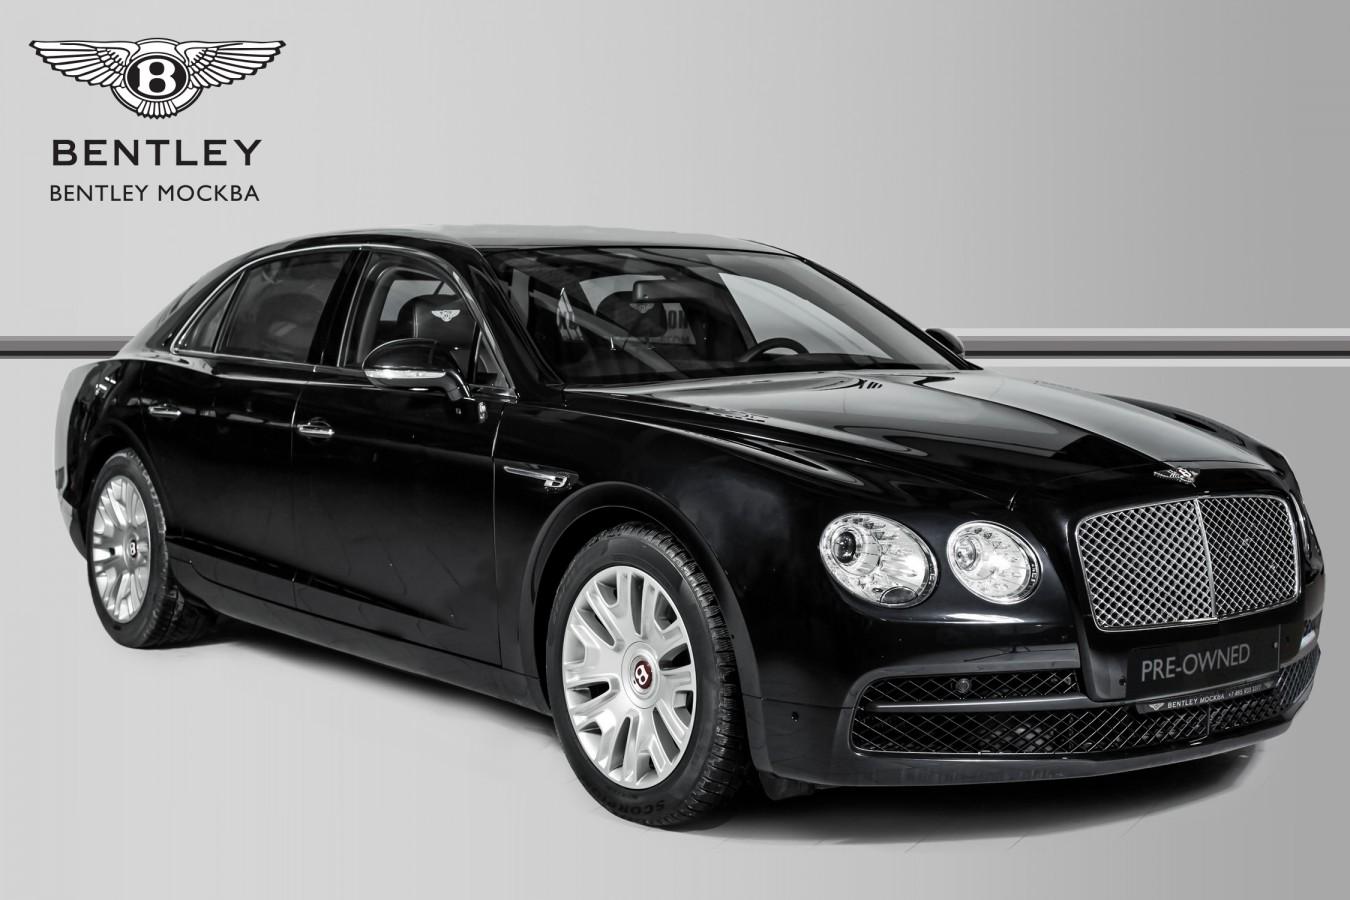 Bentley Continental GT Speed - изображение FS-V8-42063-test-3 на Bentleymoscow.ru!